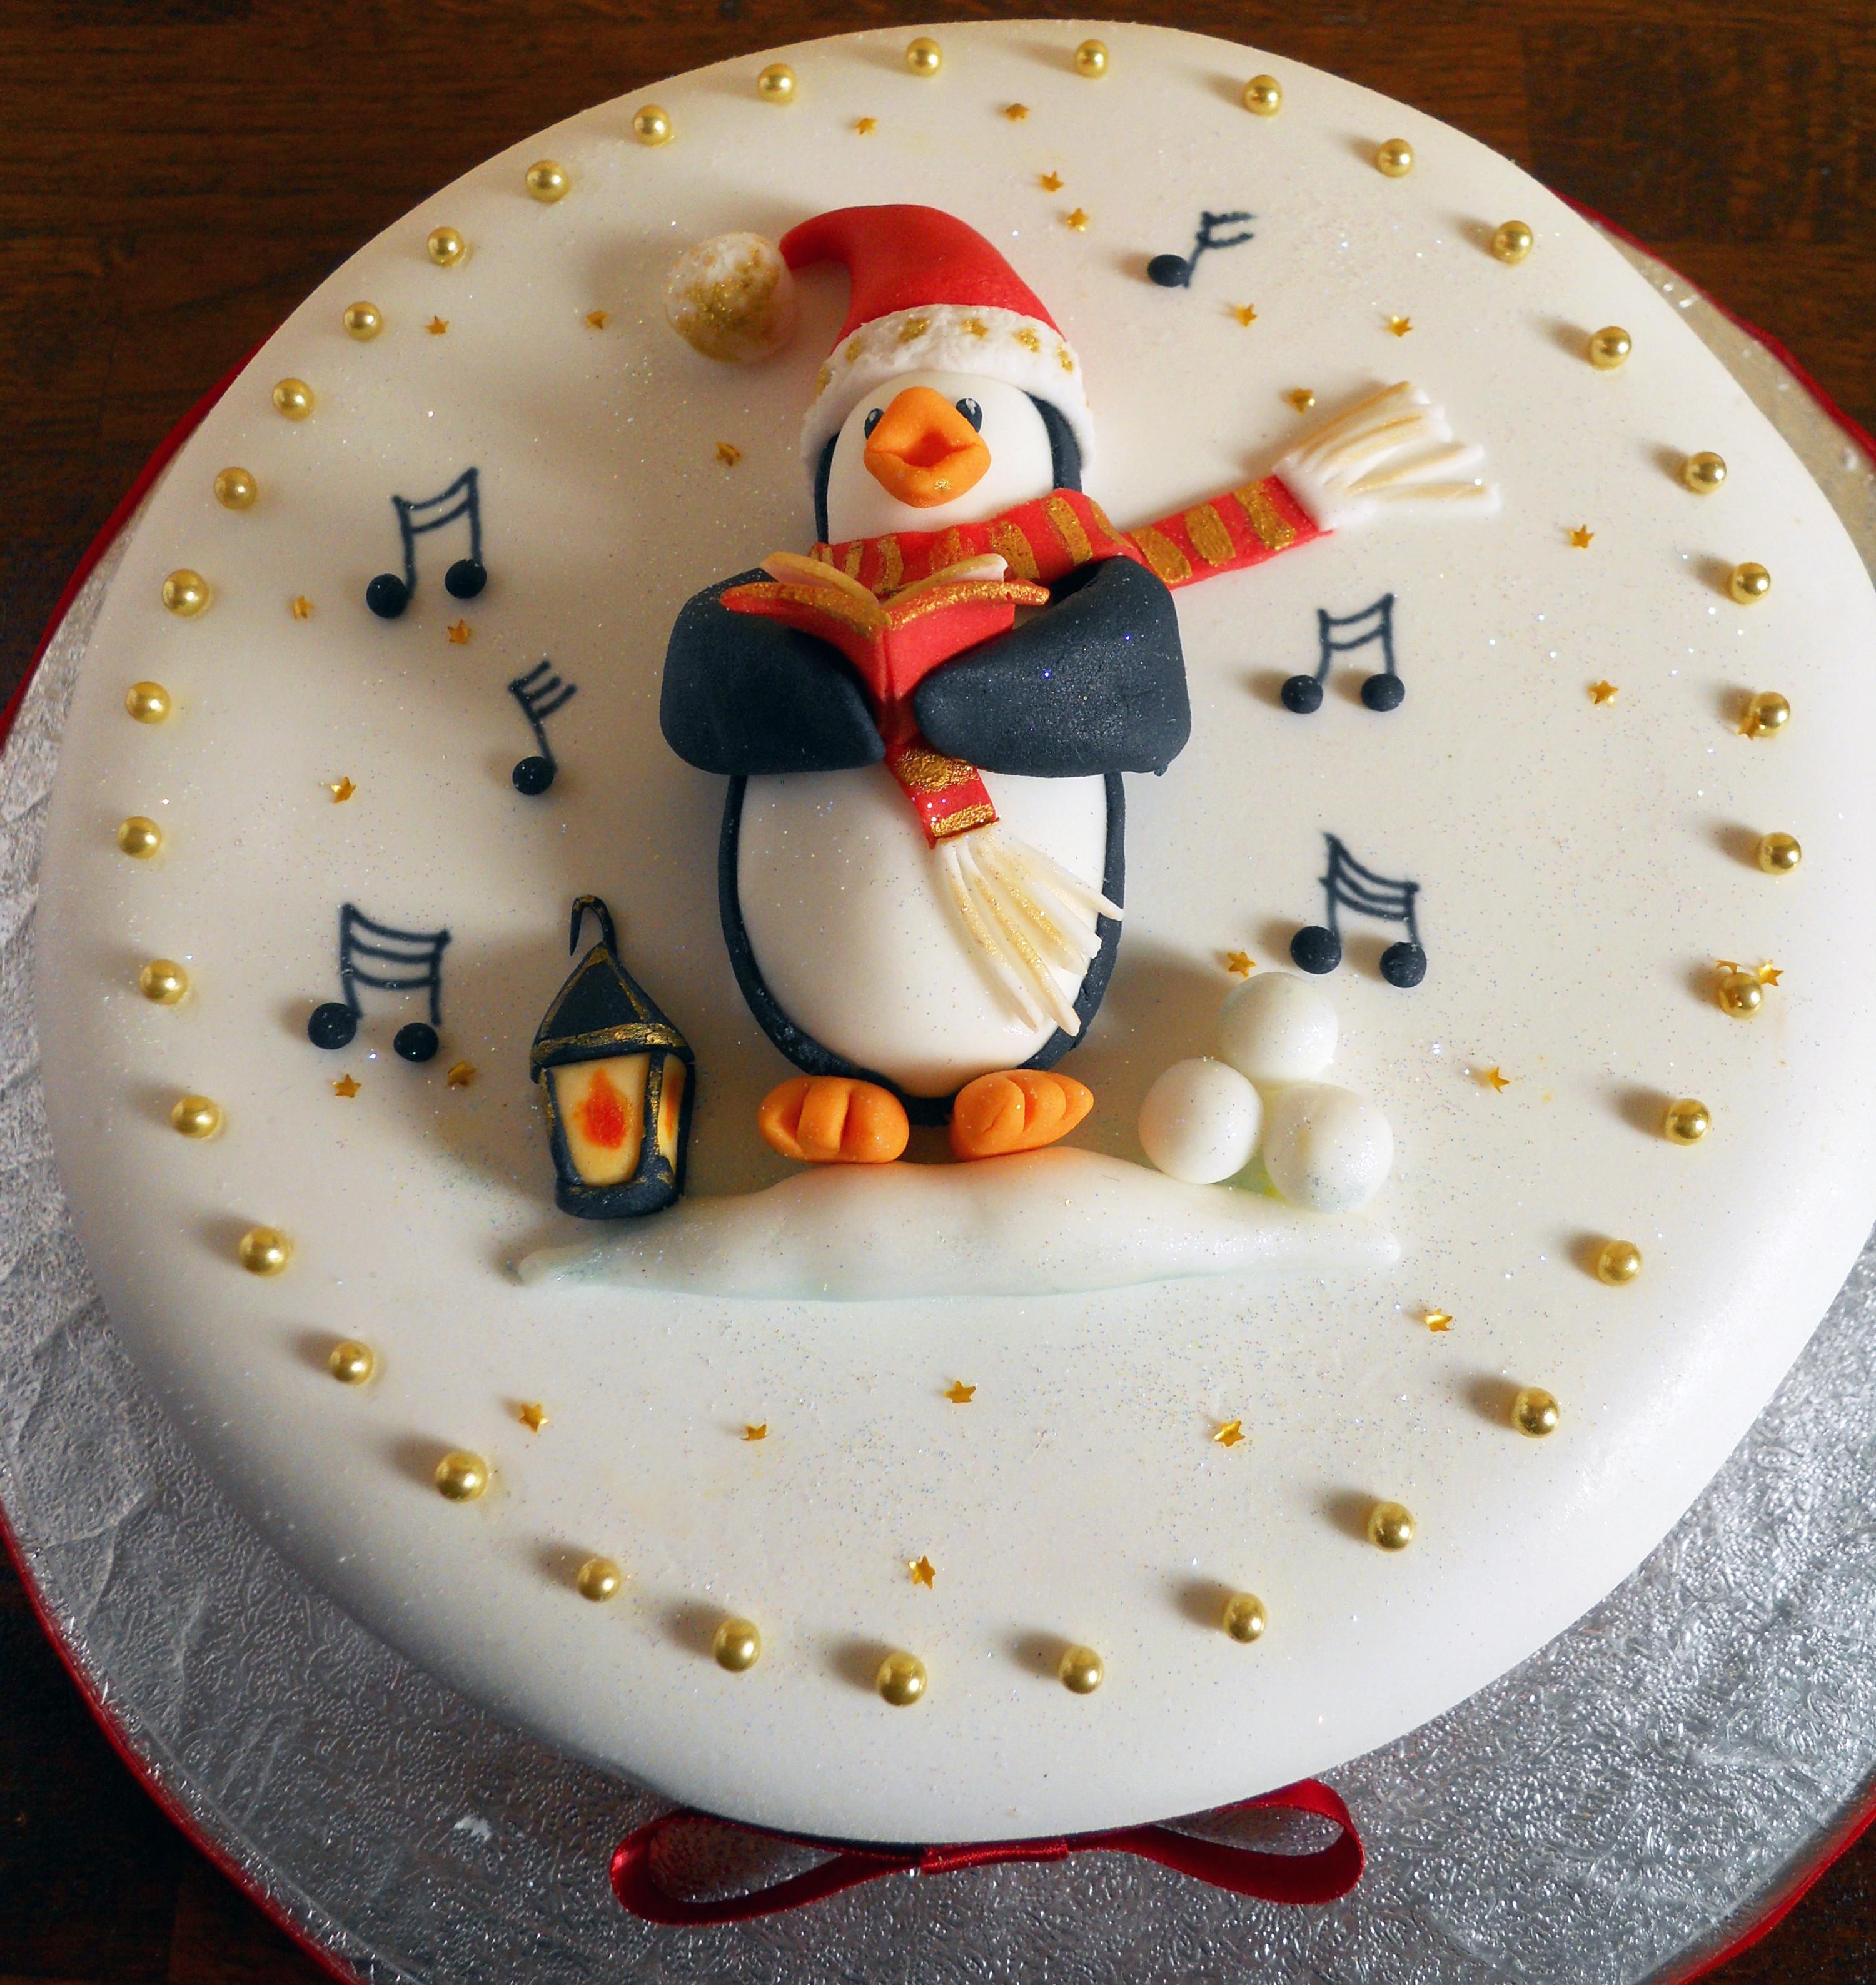 Christmas Cakes Images  Penguin Carol Singer Christmas Cake – Orders now being taken